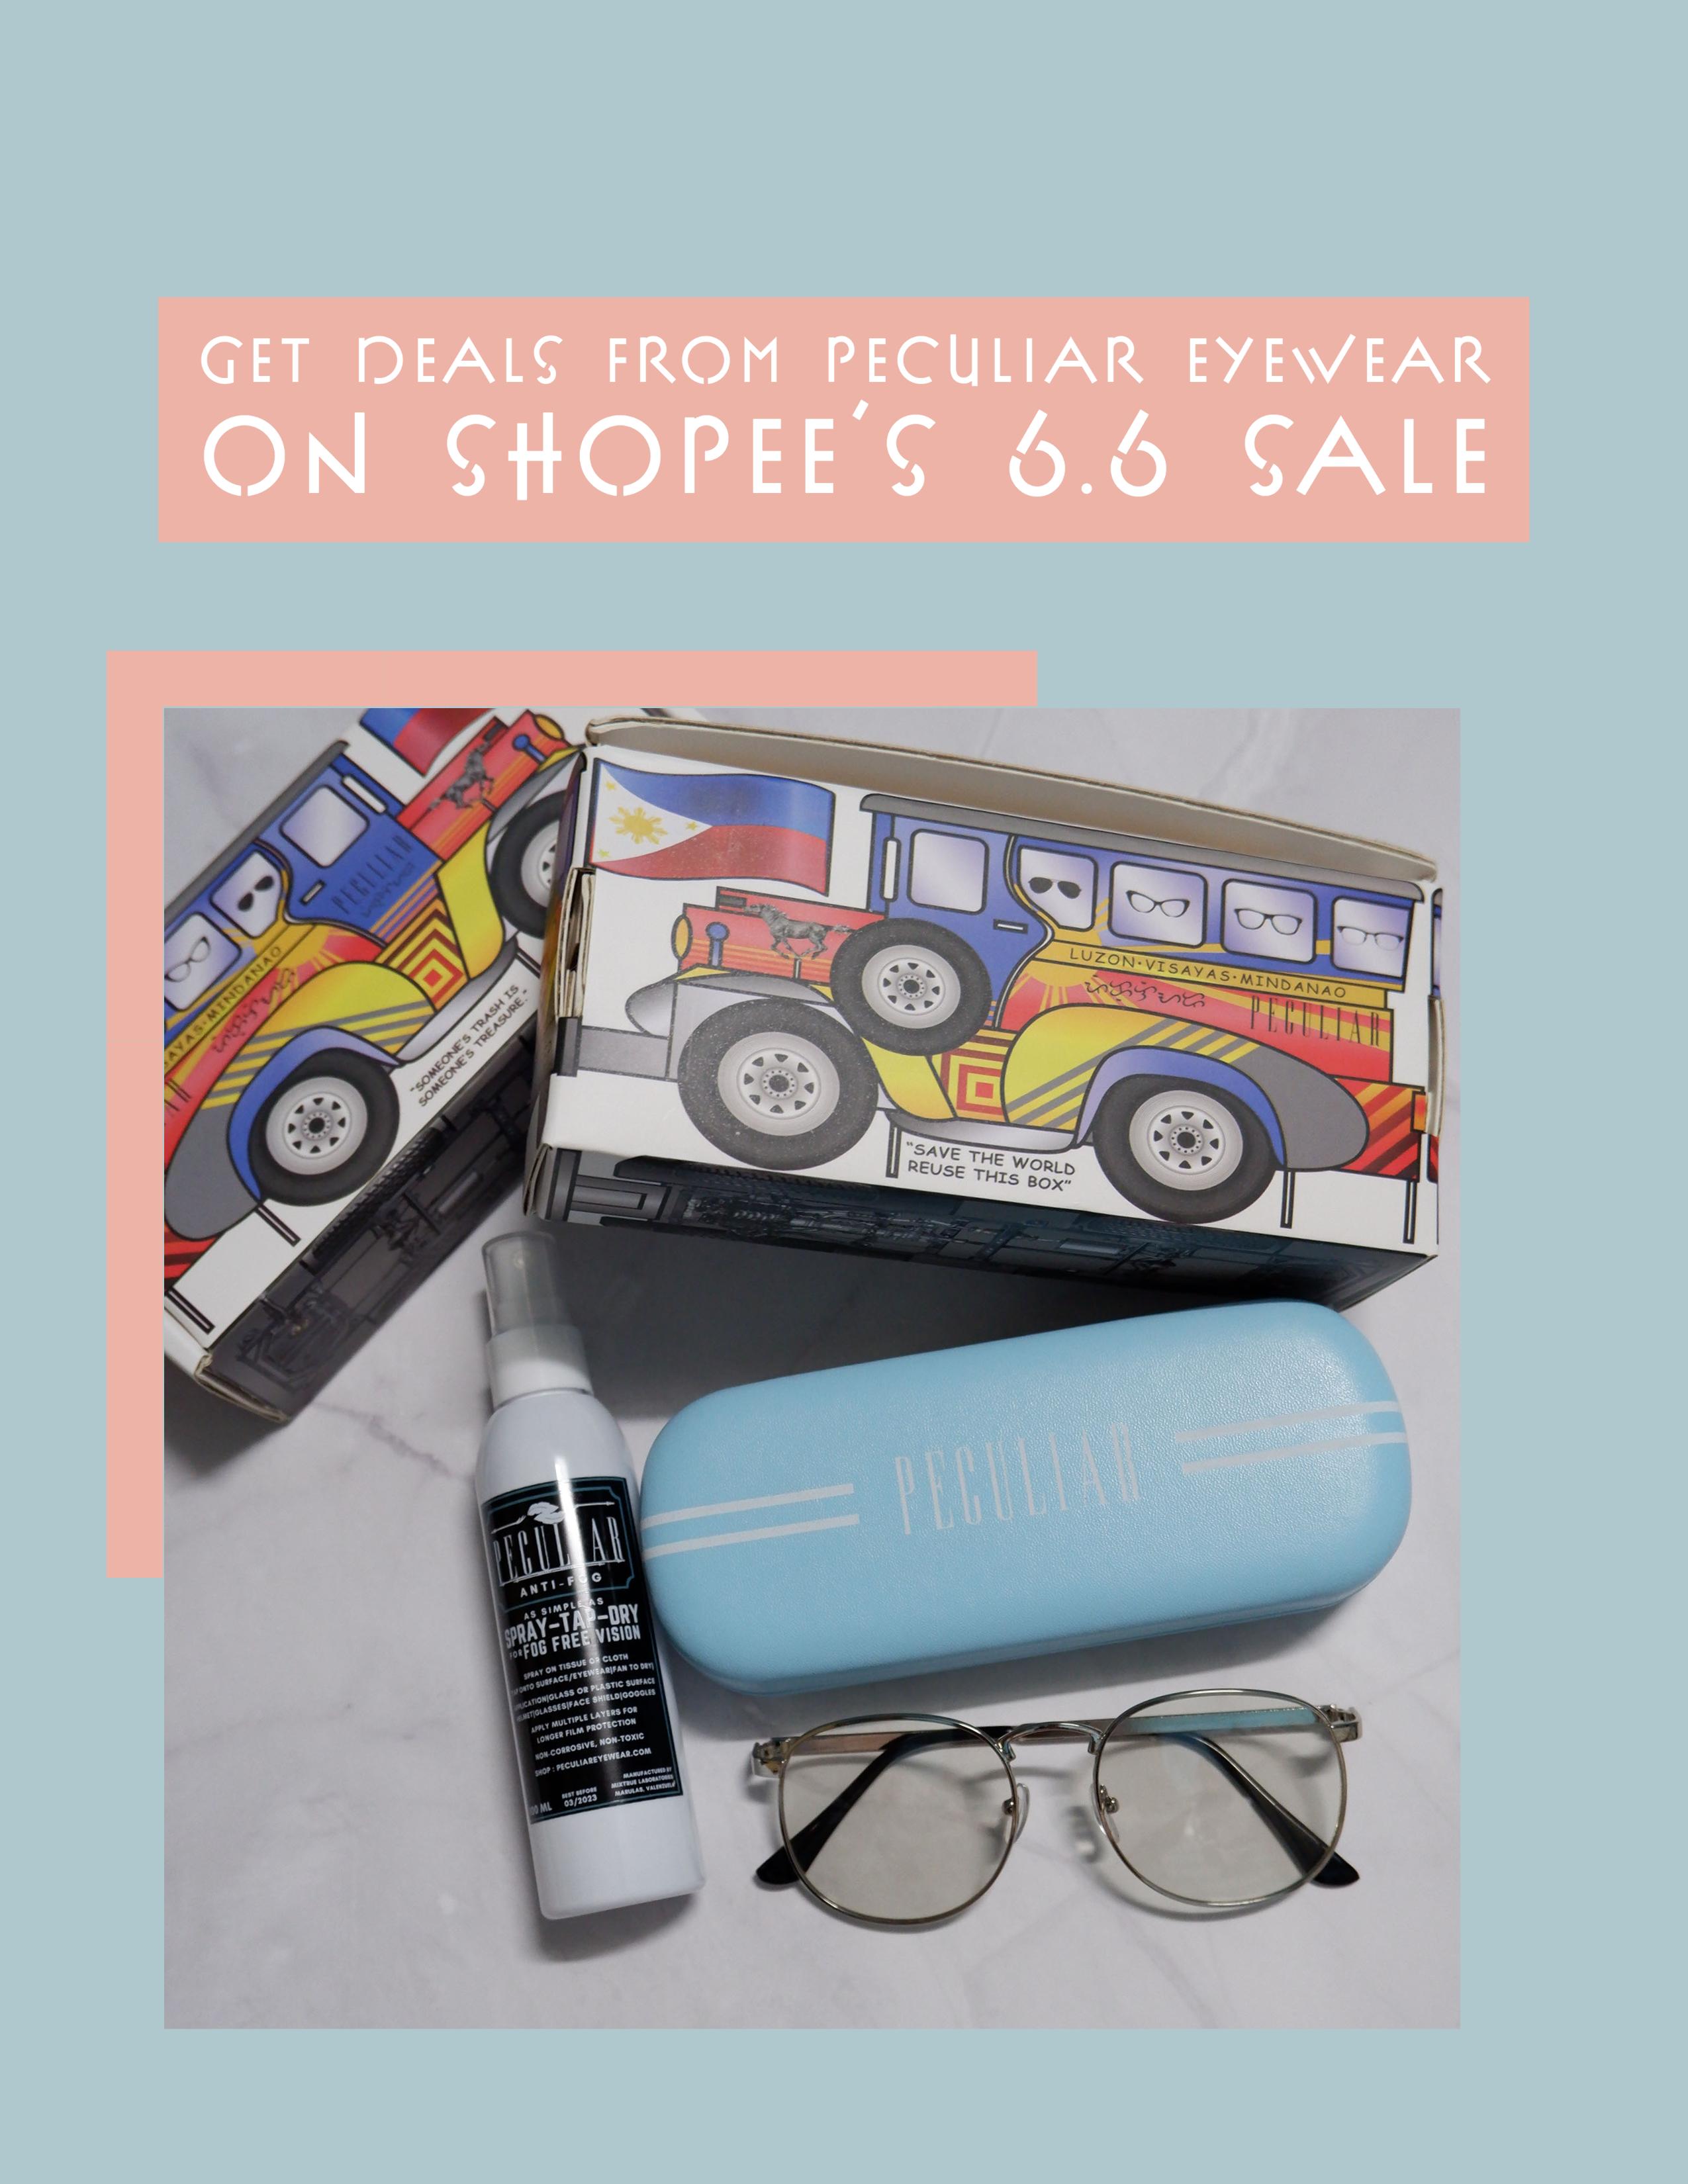 Get deals from Peculiar Eyewear's Shopee 6.6. sale